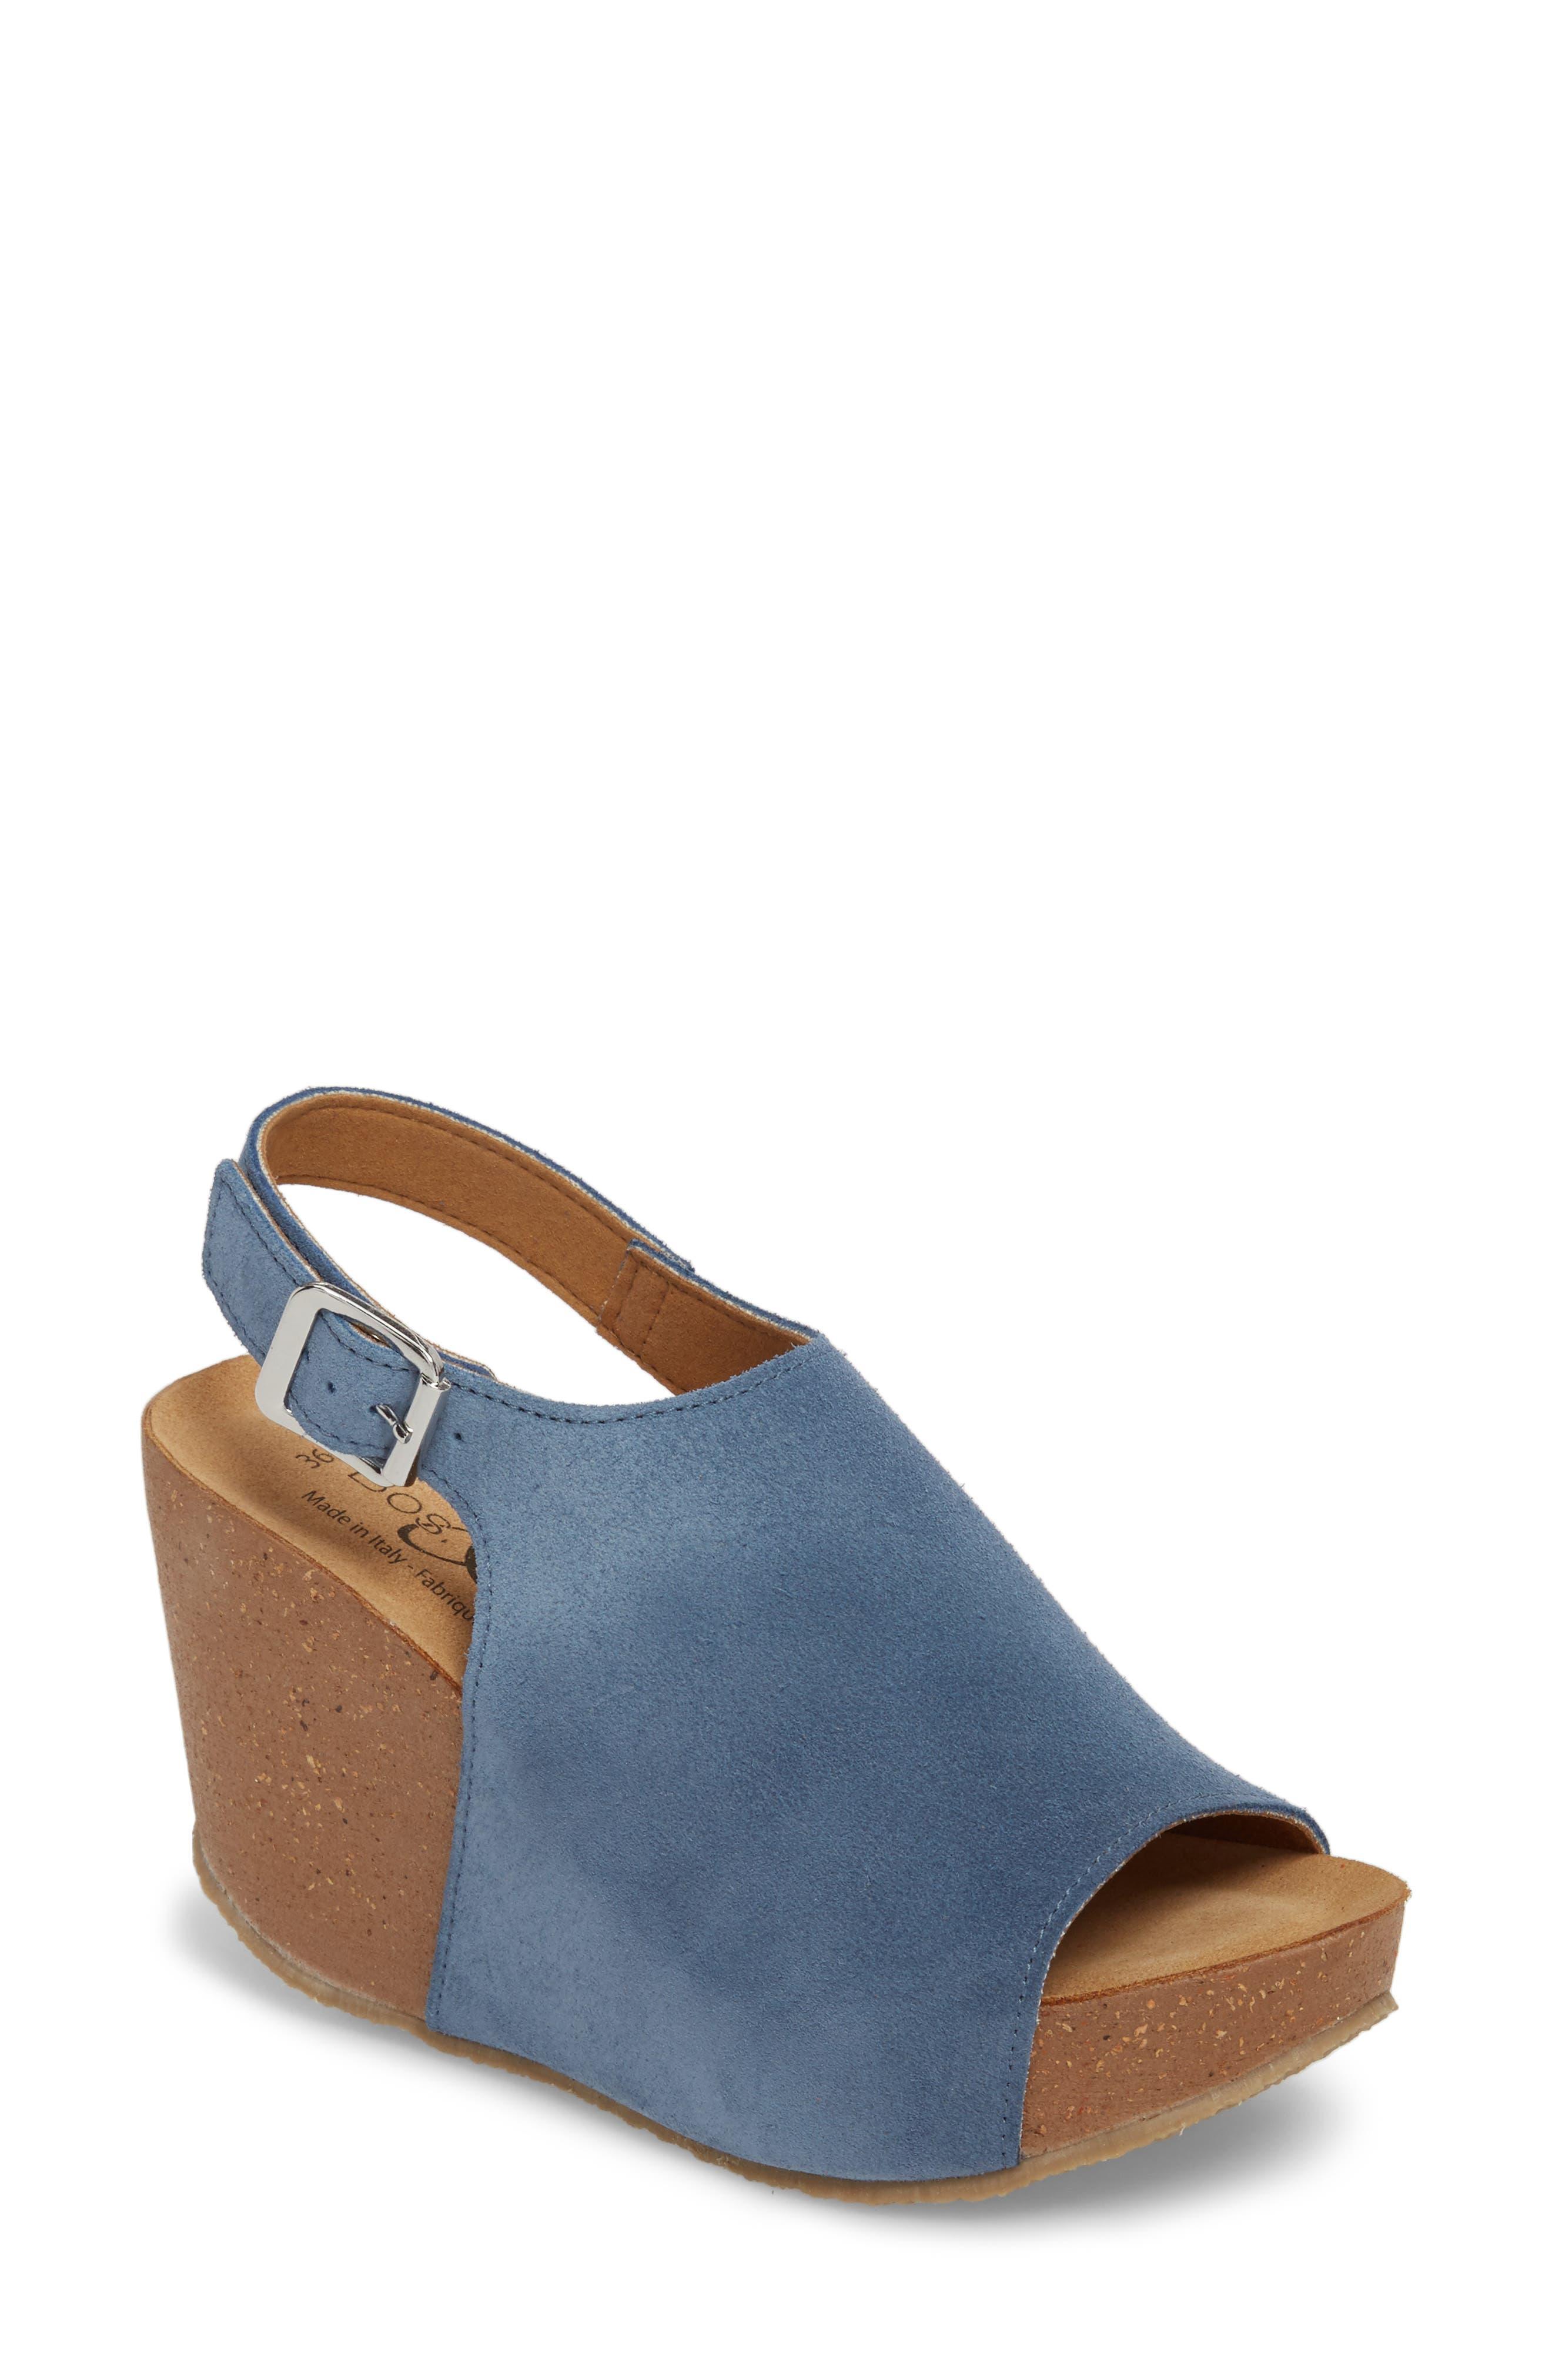 Bos. & Co. Sheila Platform Wedge Sandal - Blue